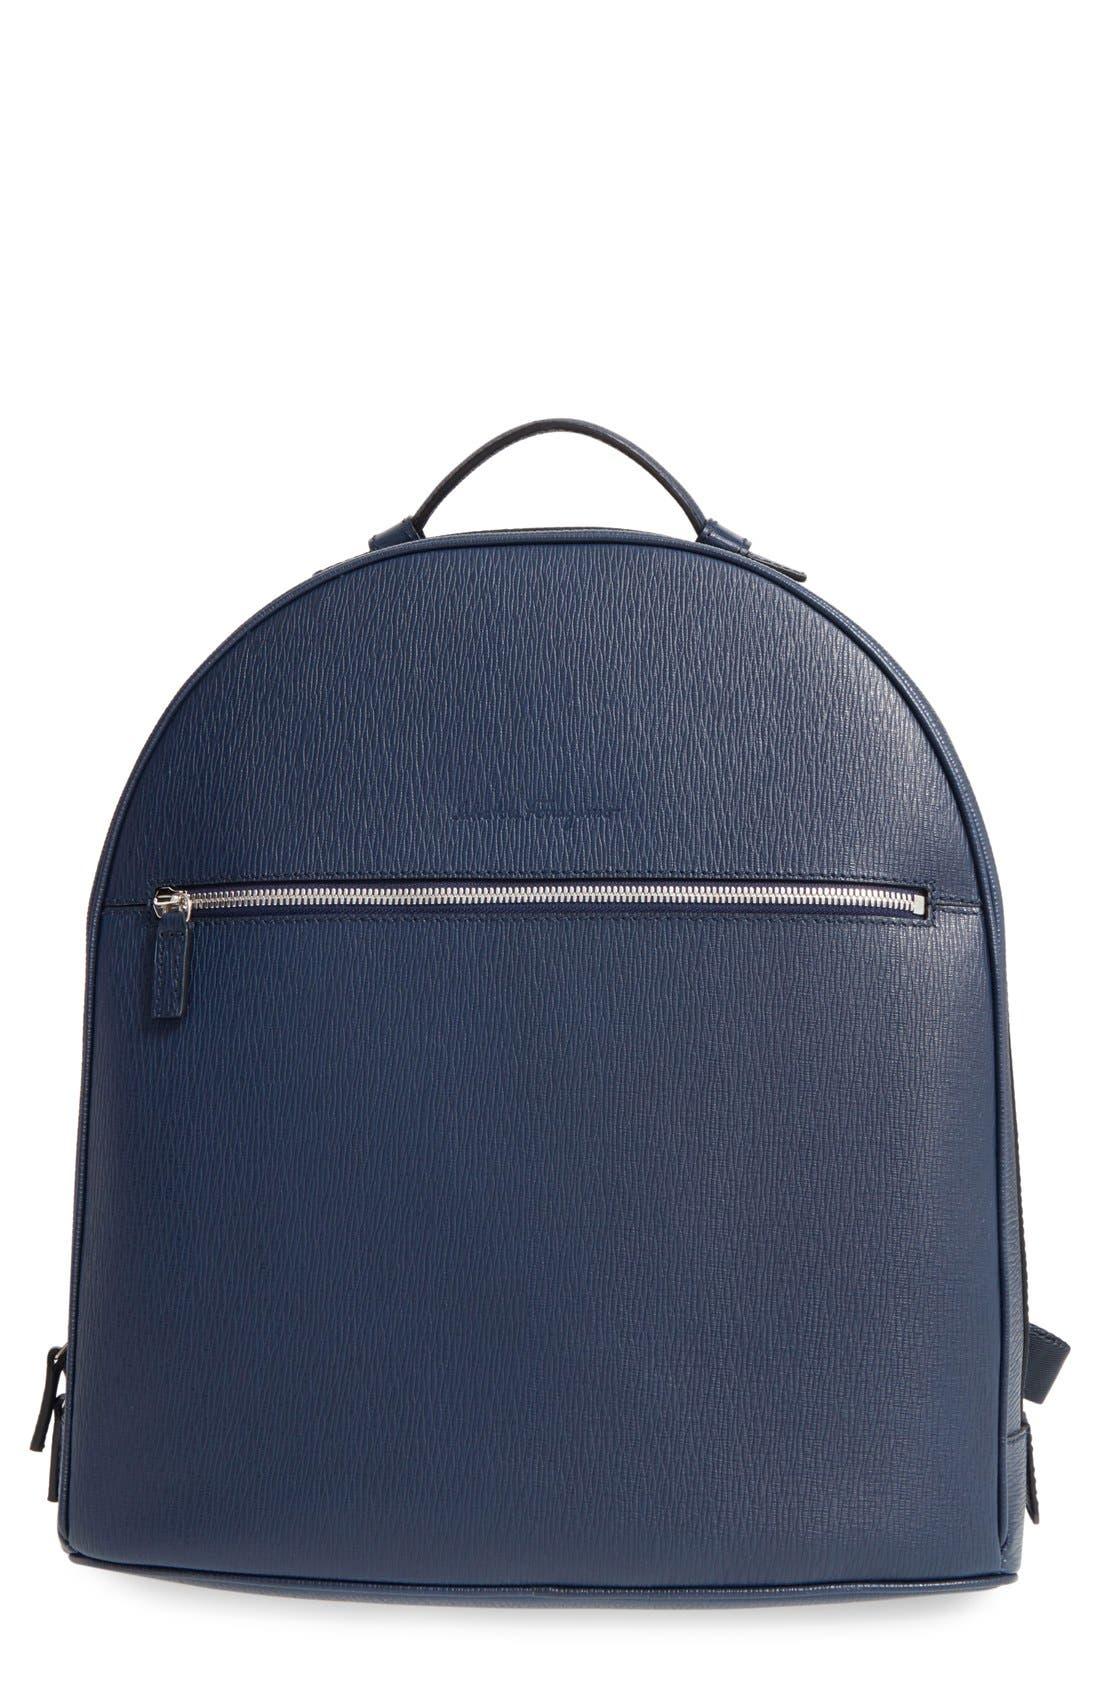 Salvatore Ferragamo 'Revival' Leather Backpack